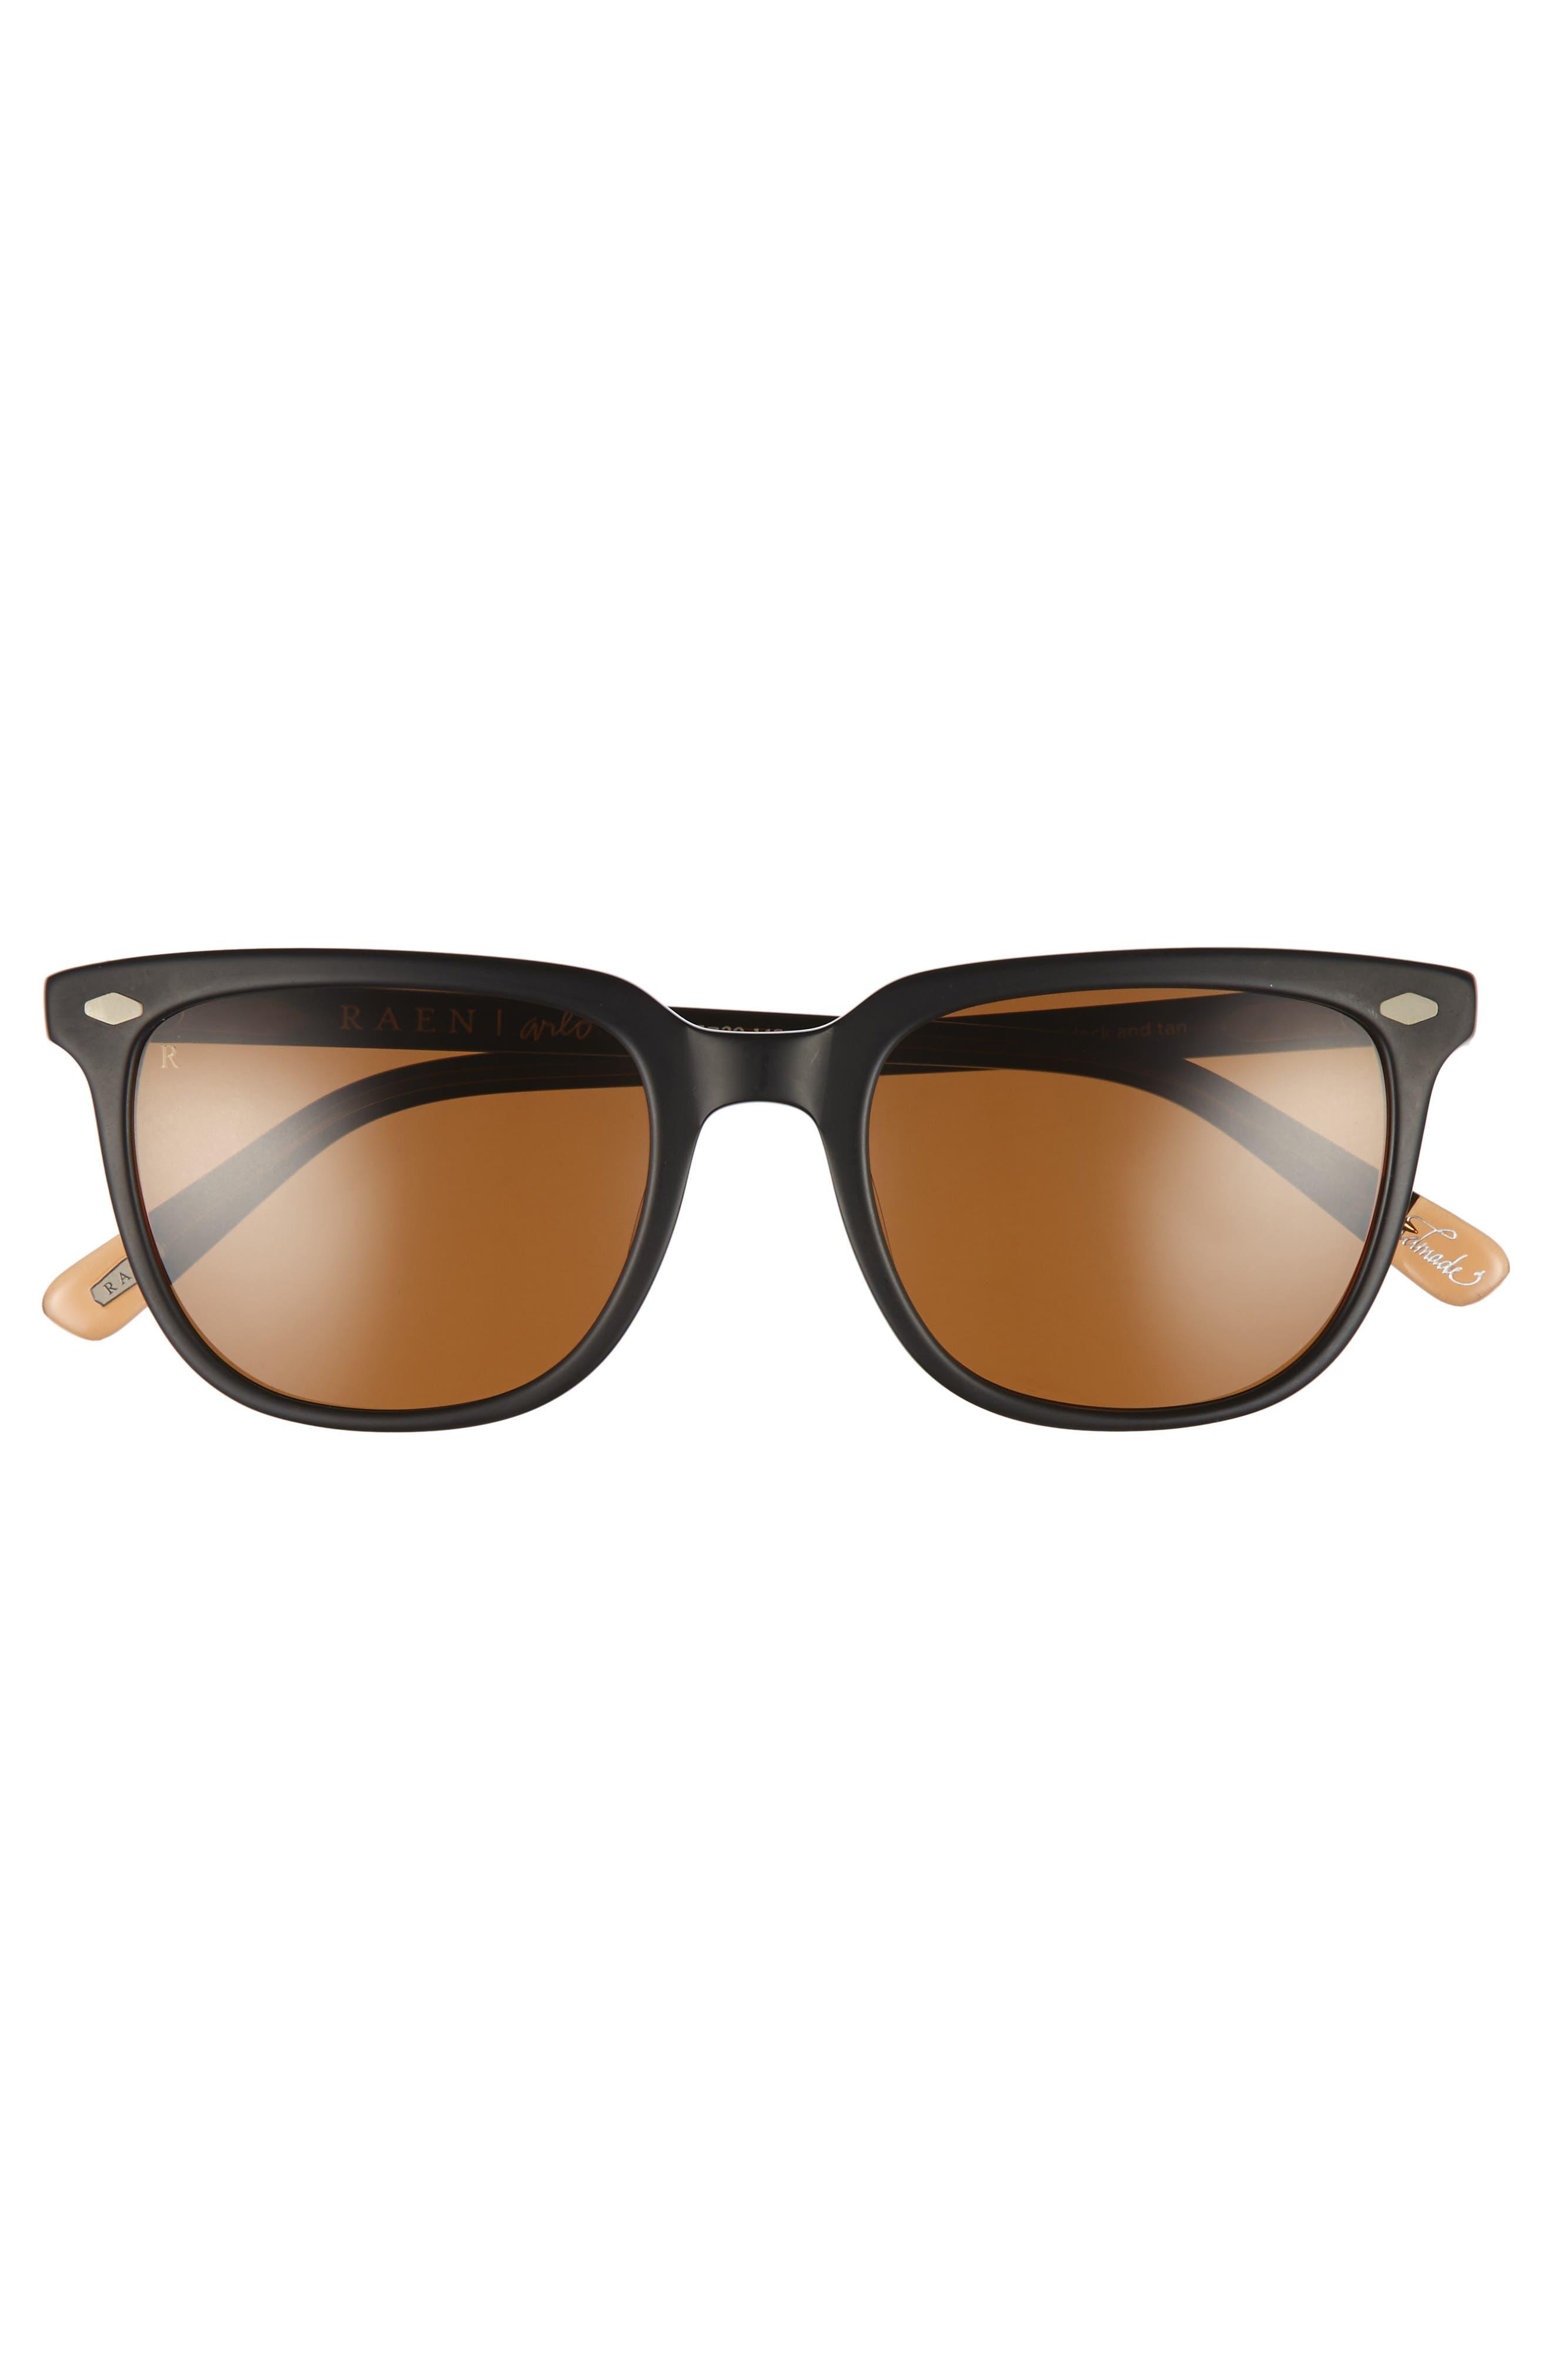 Arlo 53mm Polarized Sunglasses,                             Alternate thumbnail 2, color,                             Black/ Tan/ Brown